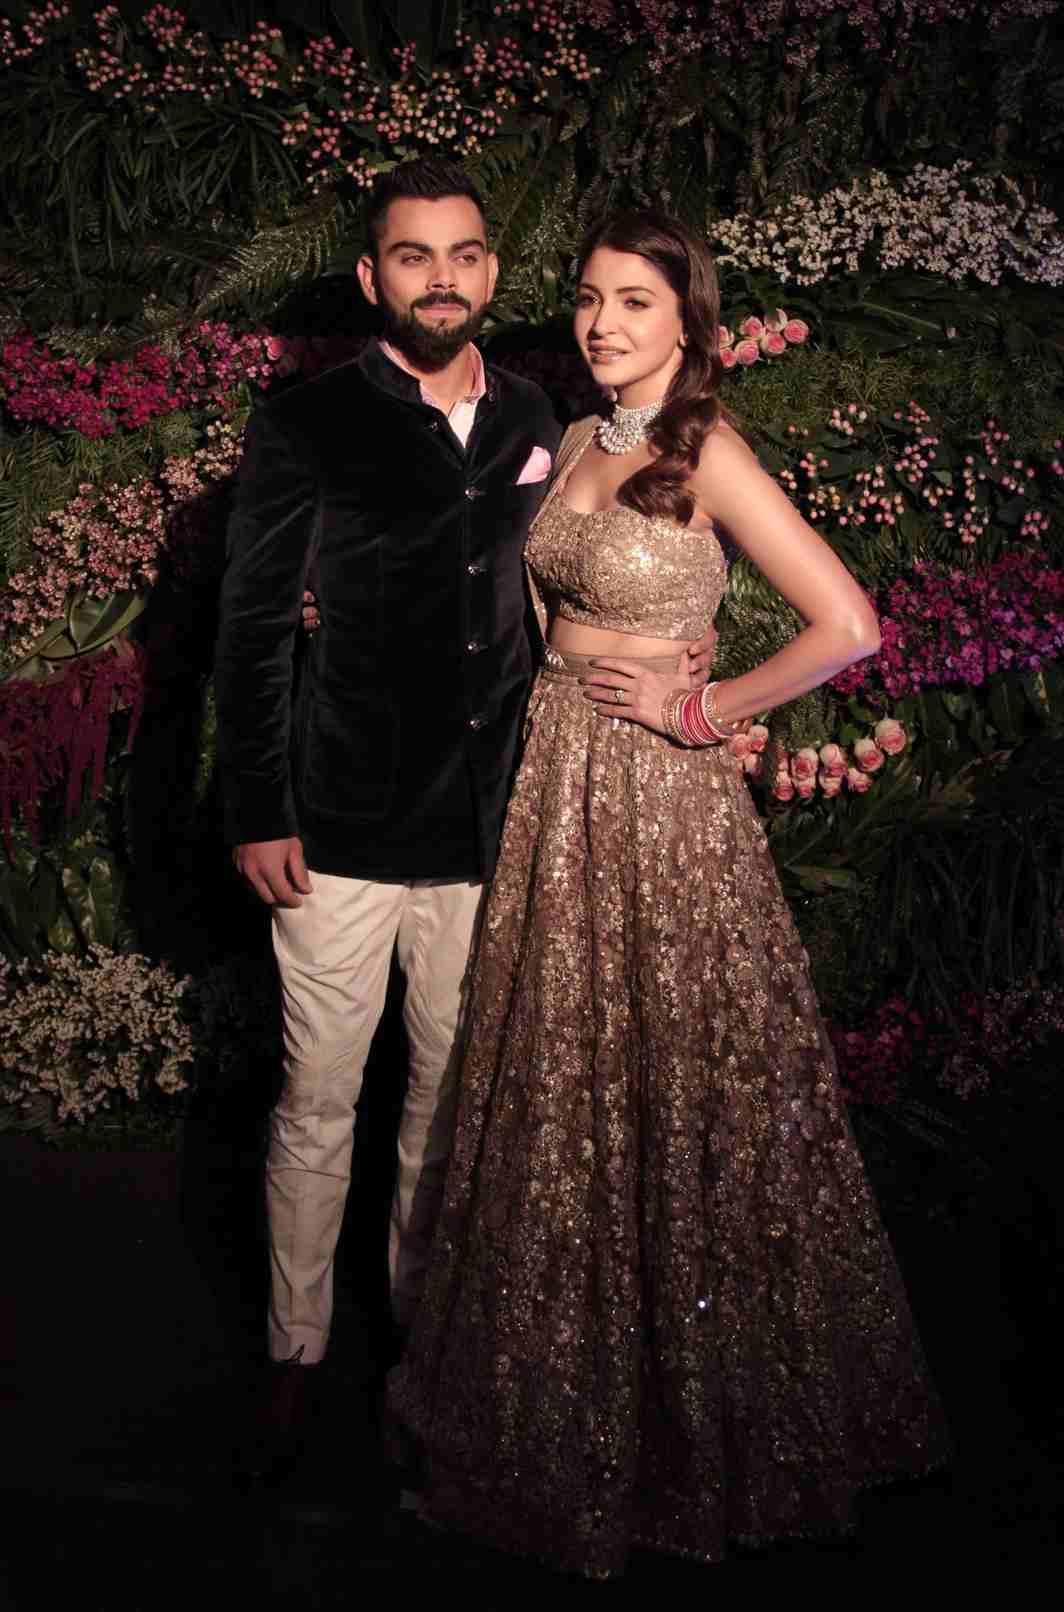 FIRST COUPLE: Indian cricket captain Virat Kohli with wife actress Anushka Sharma poses for photographers during their wedding reception in Mumbai, UNI